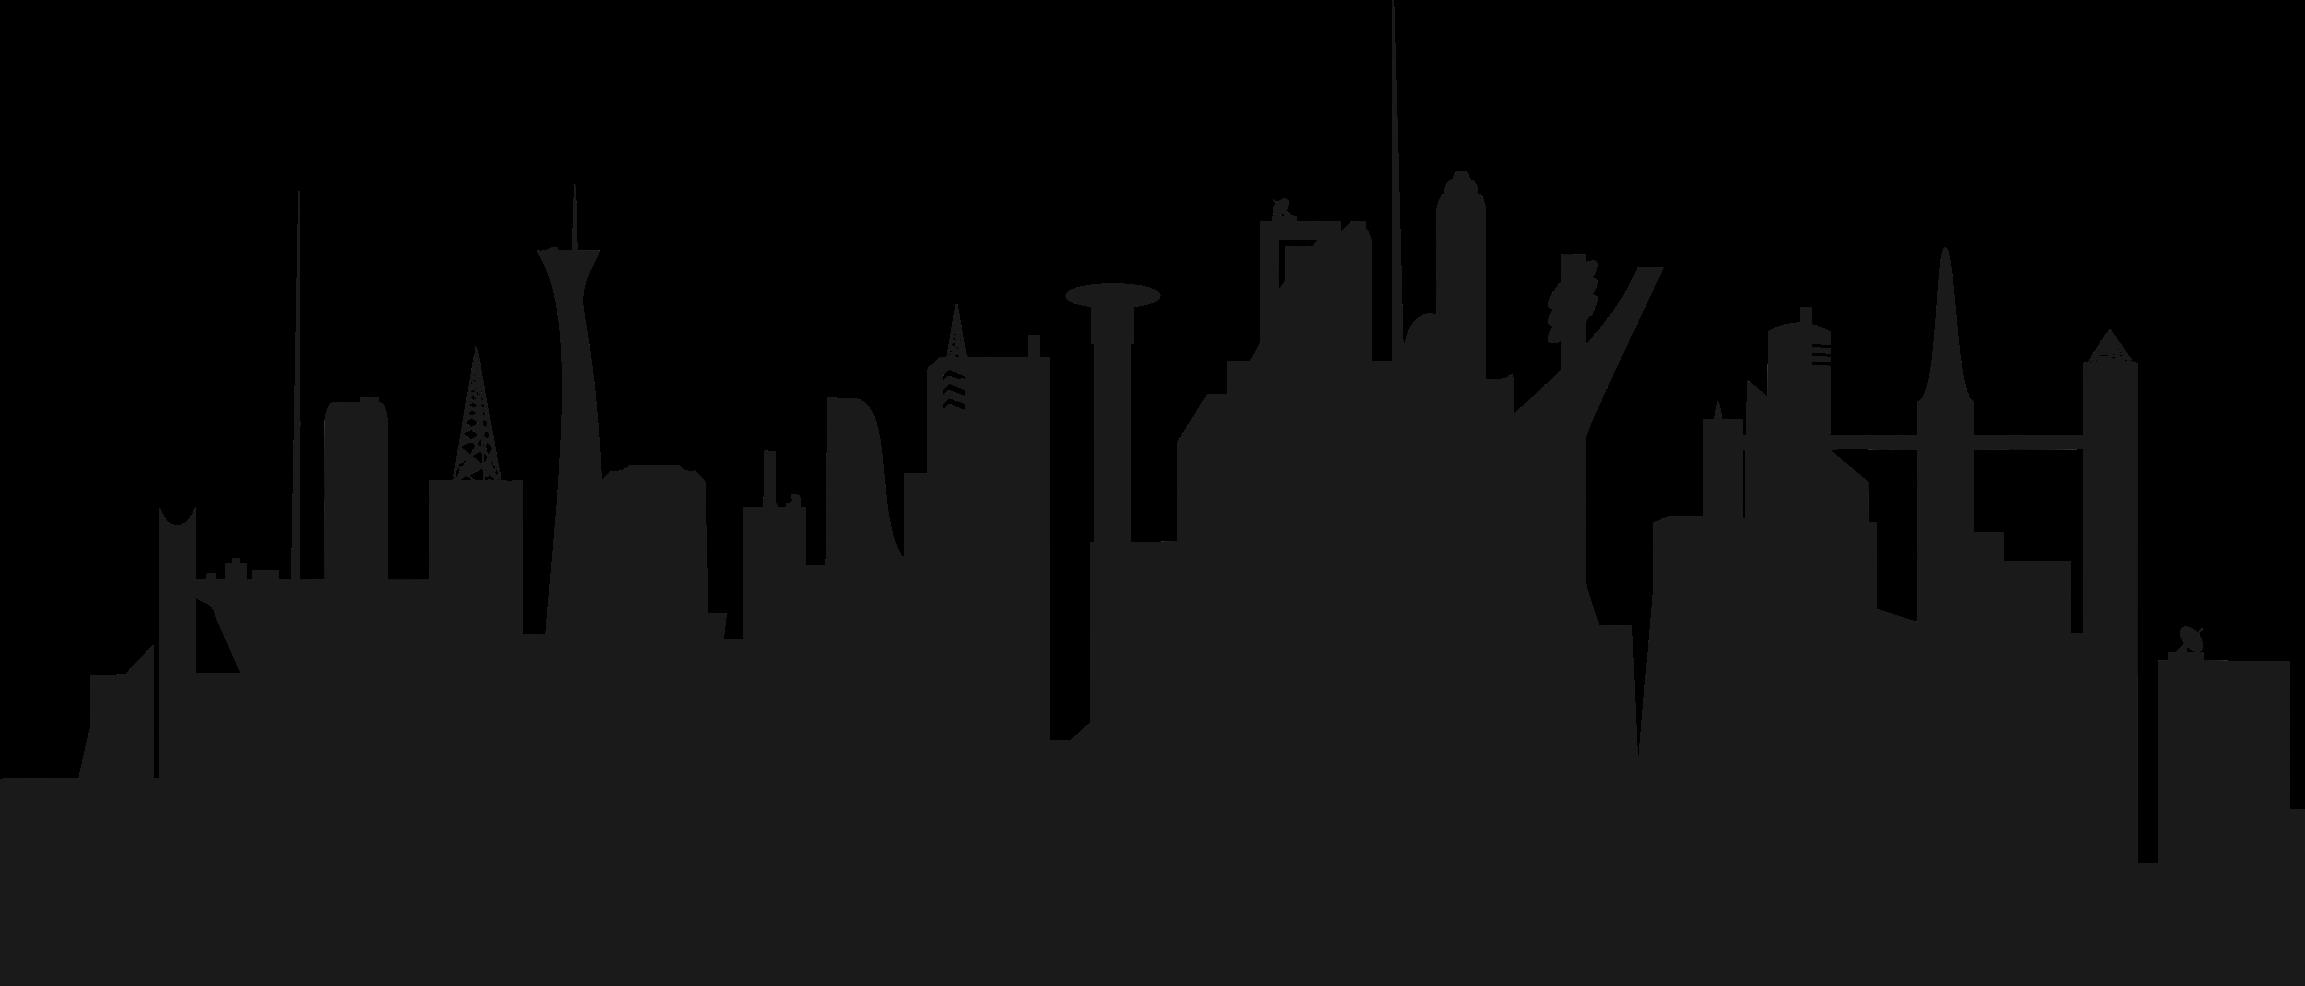 philadelphia skyline silhouette at getdrawings com free for rh getdrawings com  philadelphia skyline silhouette vector